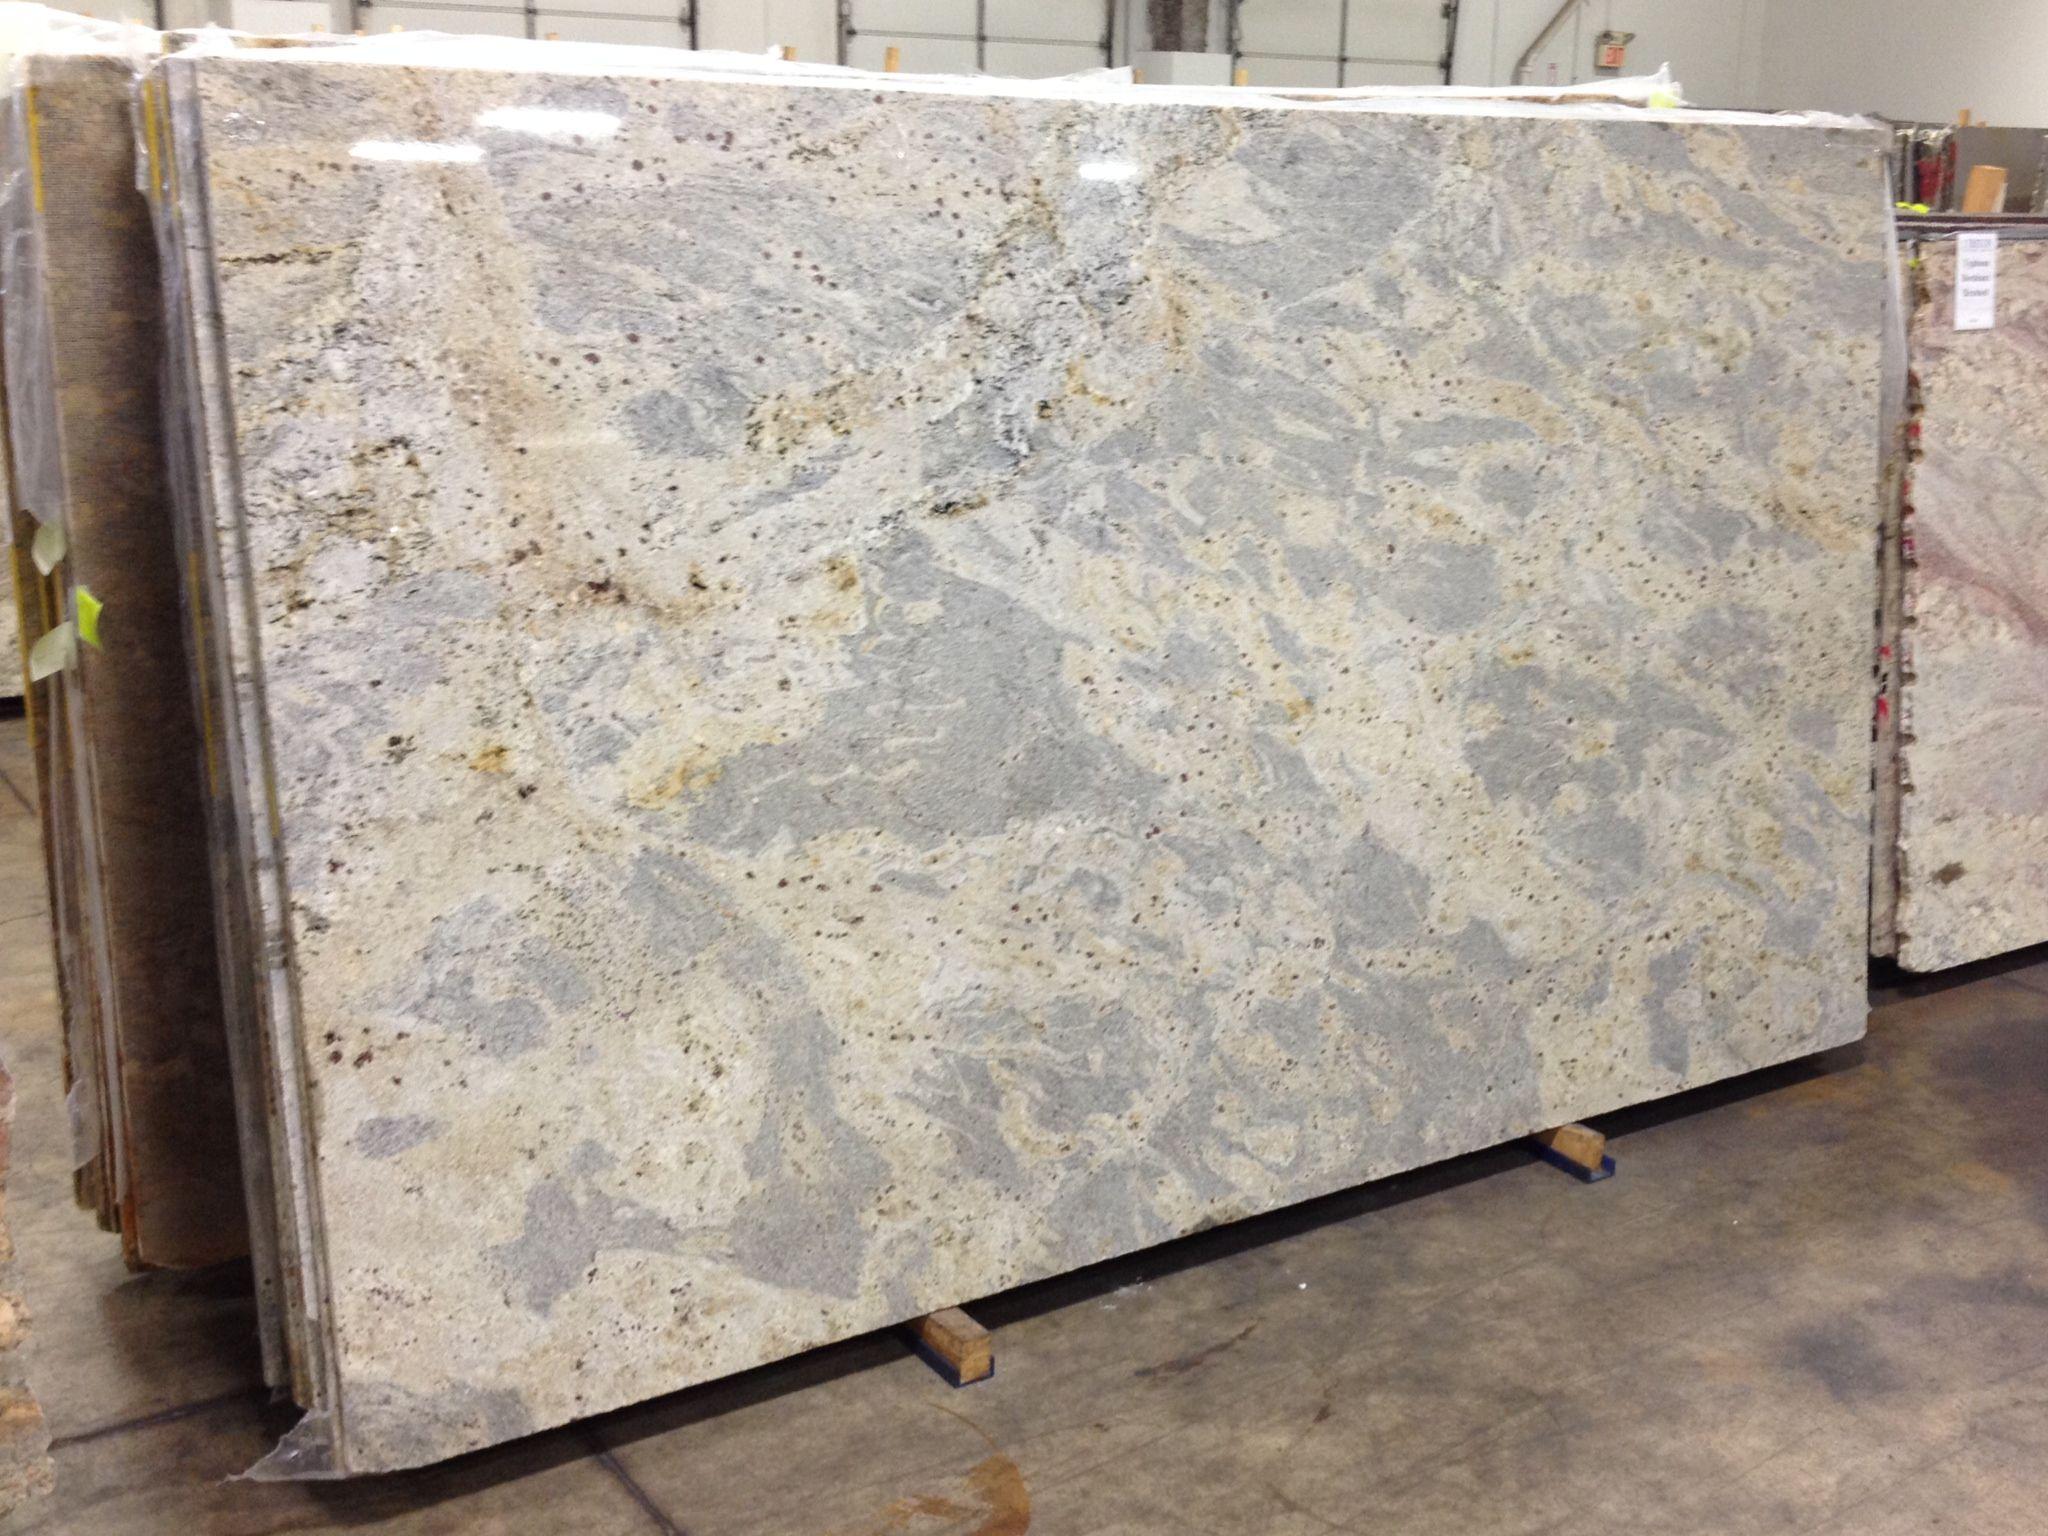 Kashmir Ivory Granite Contact Triton Stone Group Of Louisville At 502 267 9303 Tritonstonelou Granite Natura Diy Home Improvement Stone Slab Grey Granite